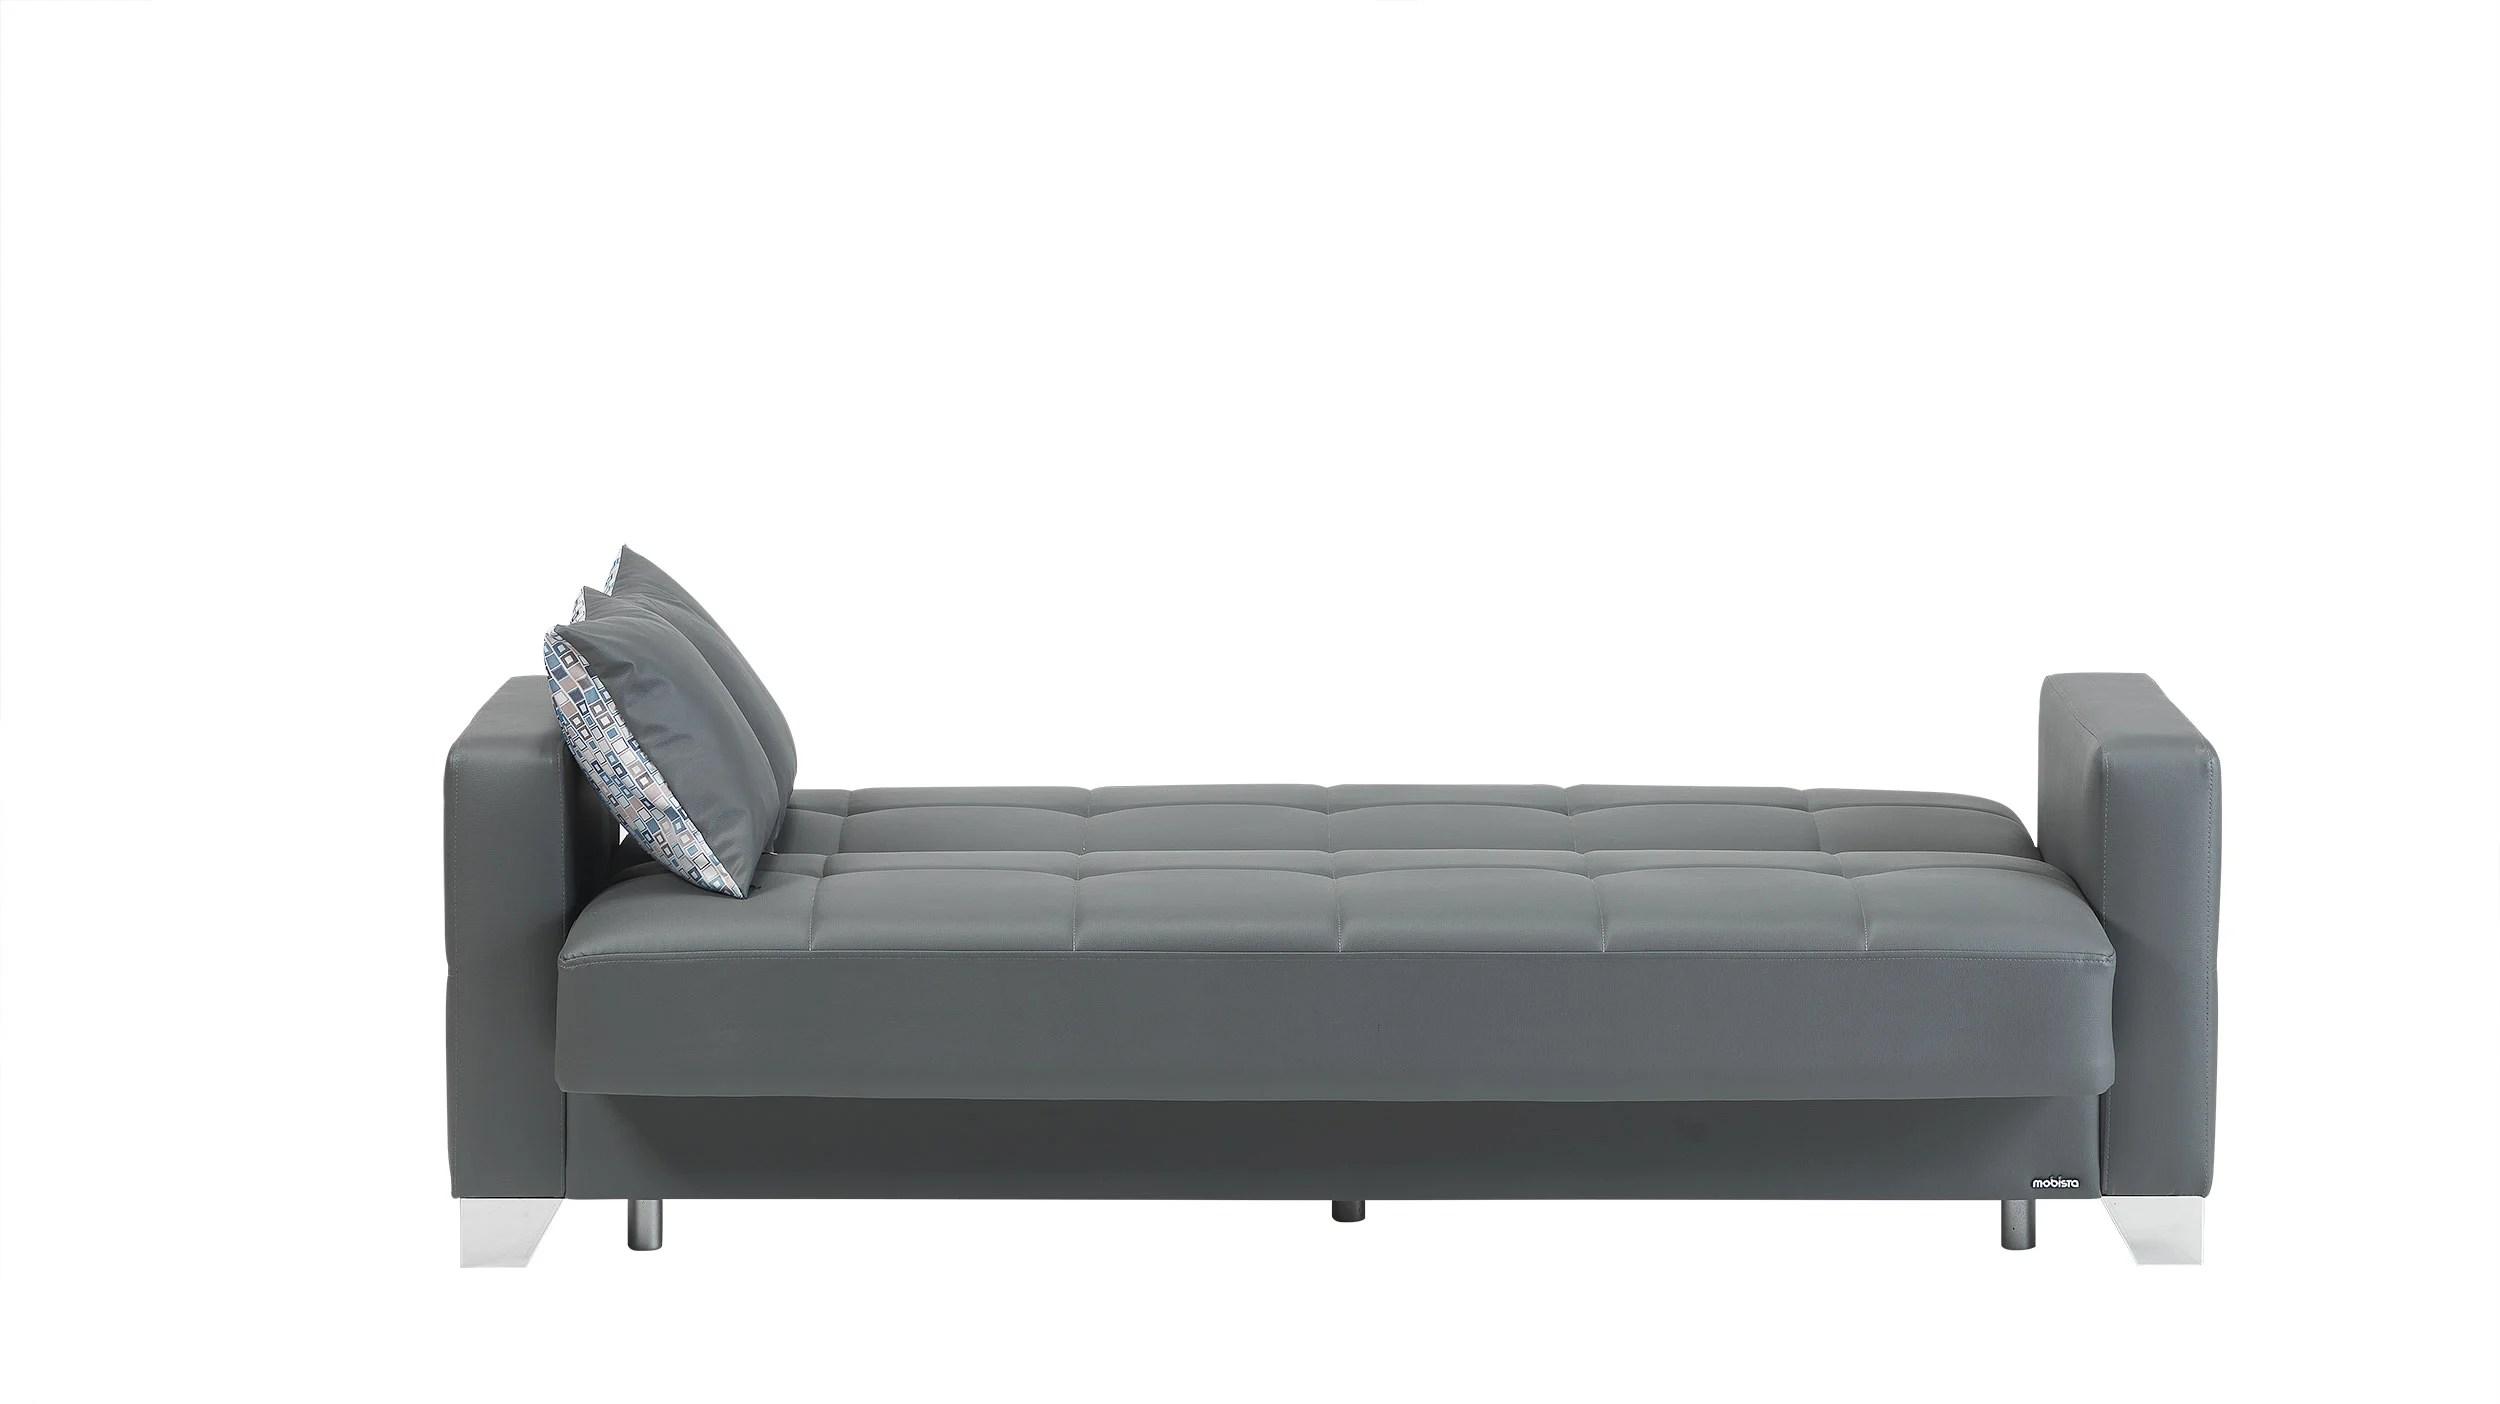 leatherette sofa durability burnt orange viva italia prestige dark gray bed by mobista